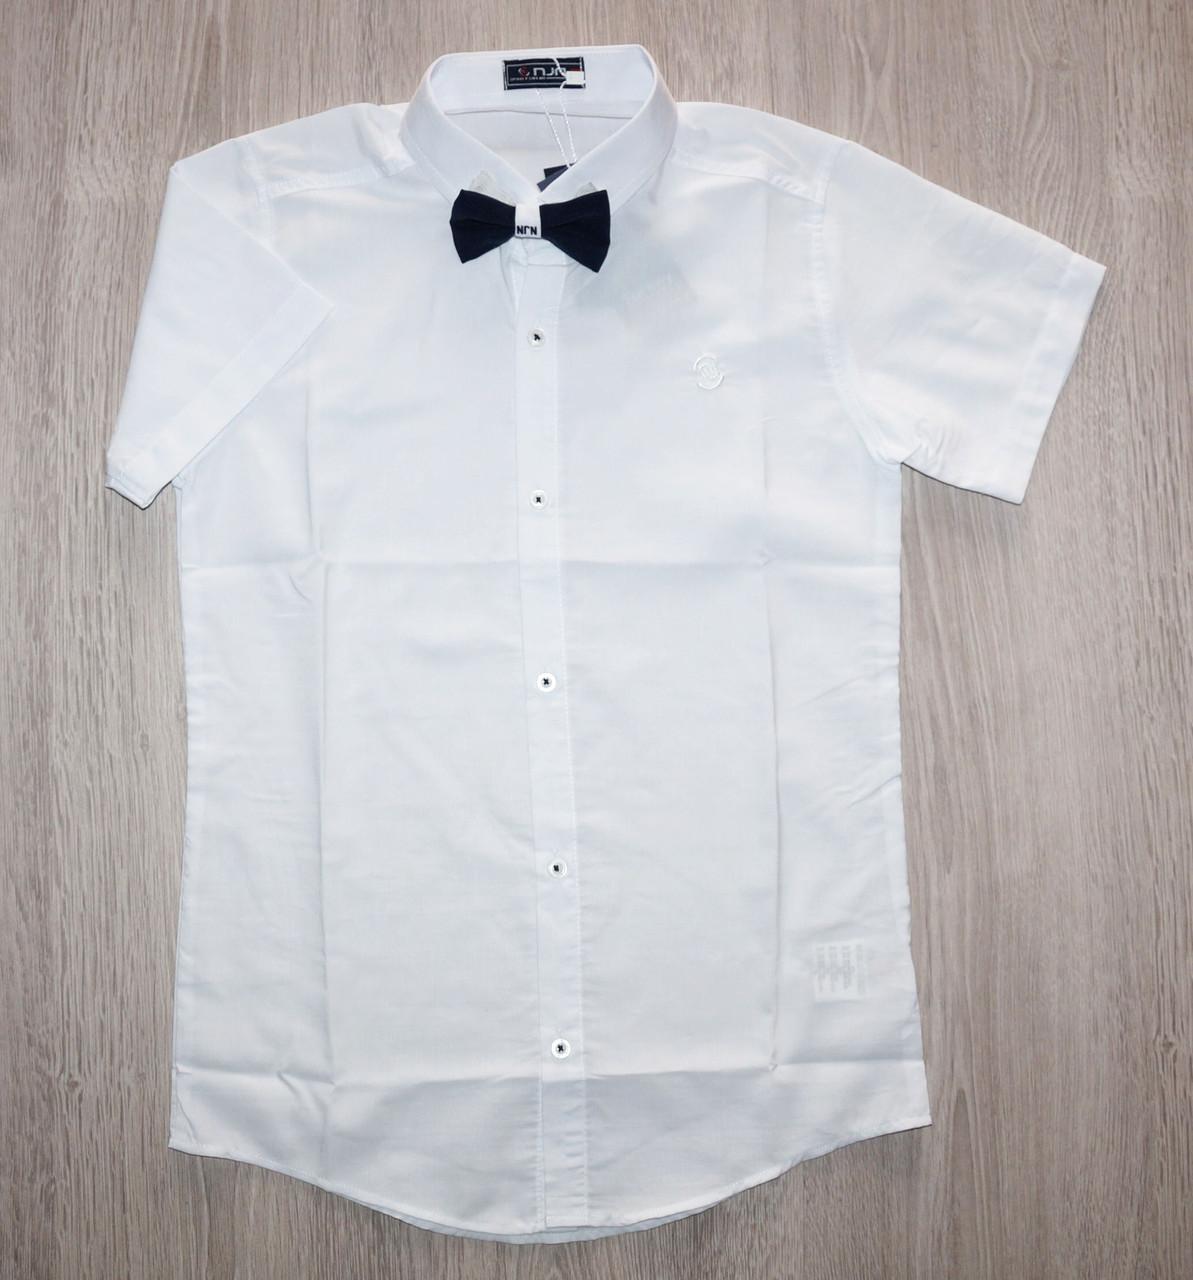 Рубашка для мальчика с коротким рукавом белая